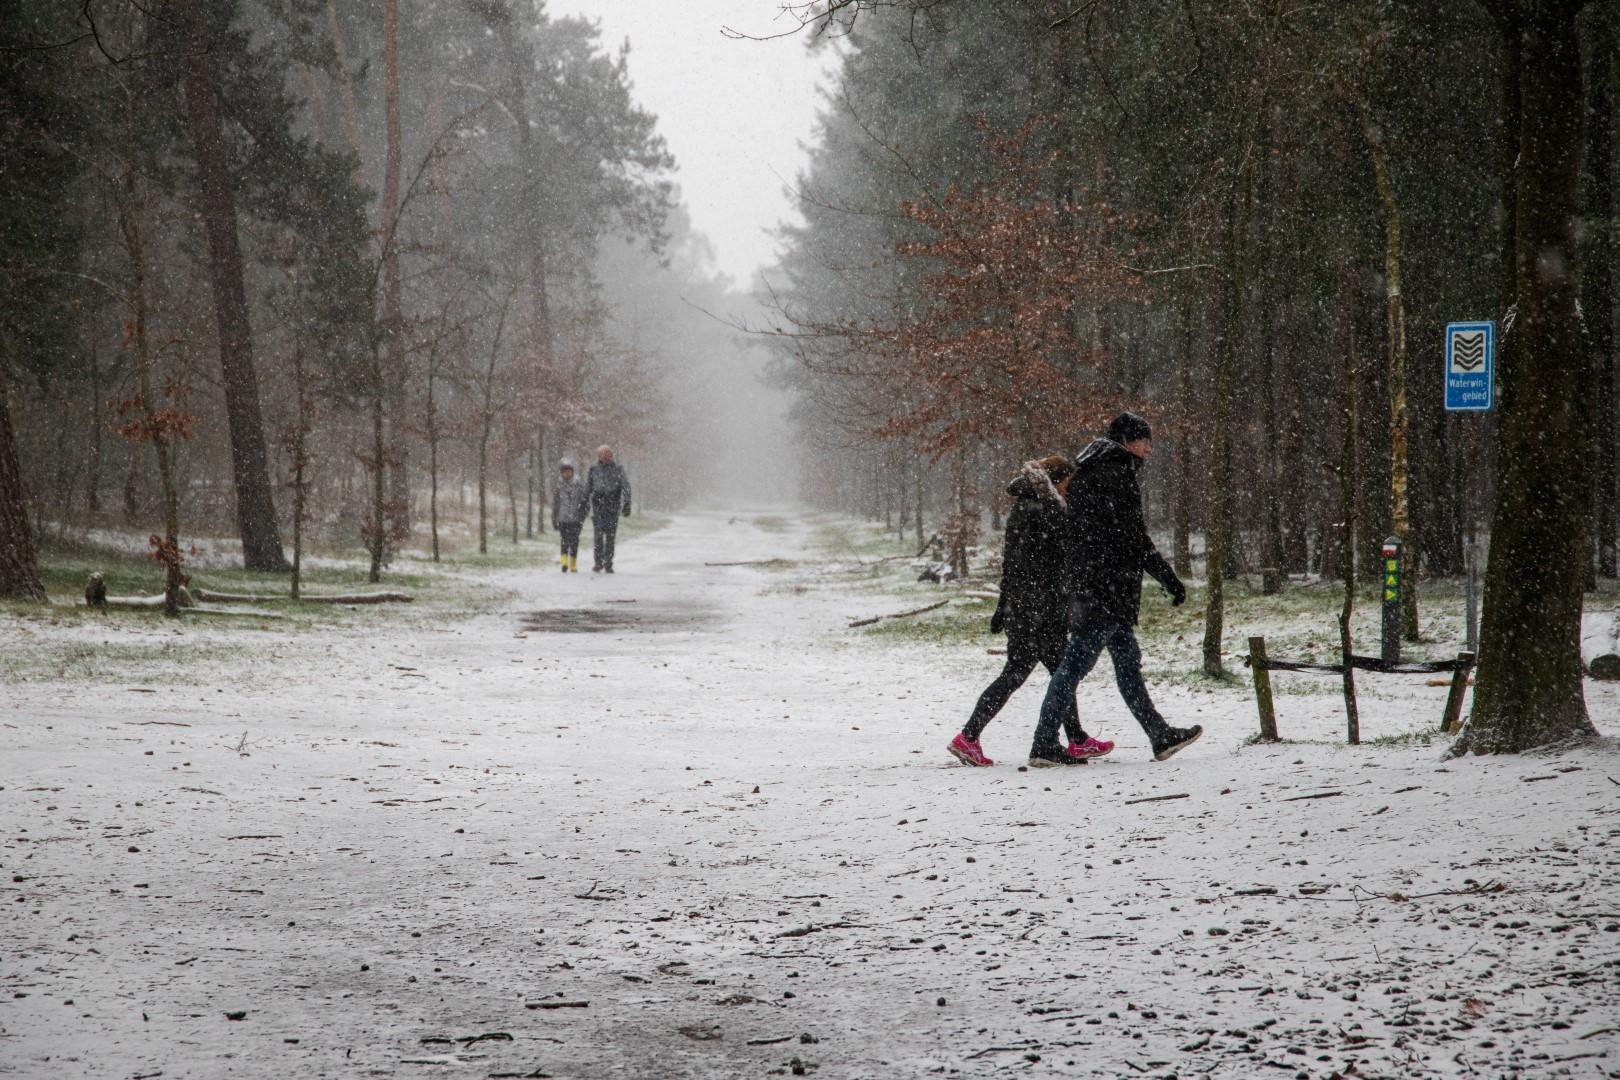 sneeuw bergen op zoom bos winter sneeuwen landgoed lievensberg wandelen